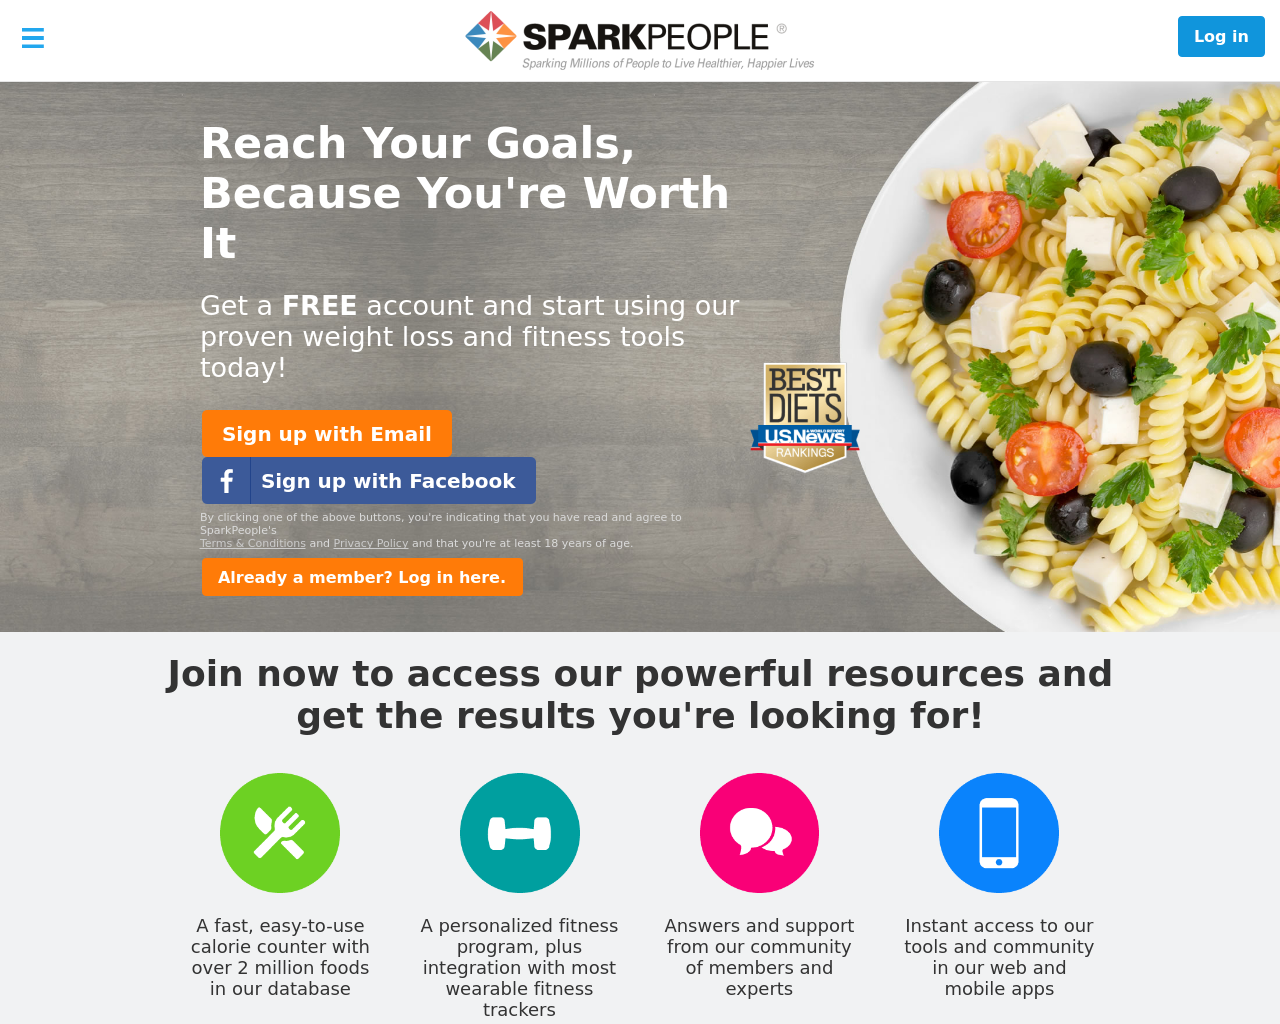 Sparkpeople-Advertising-Reviews-Pricing